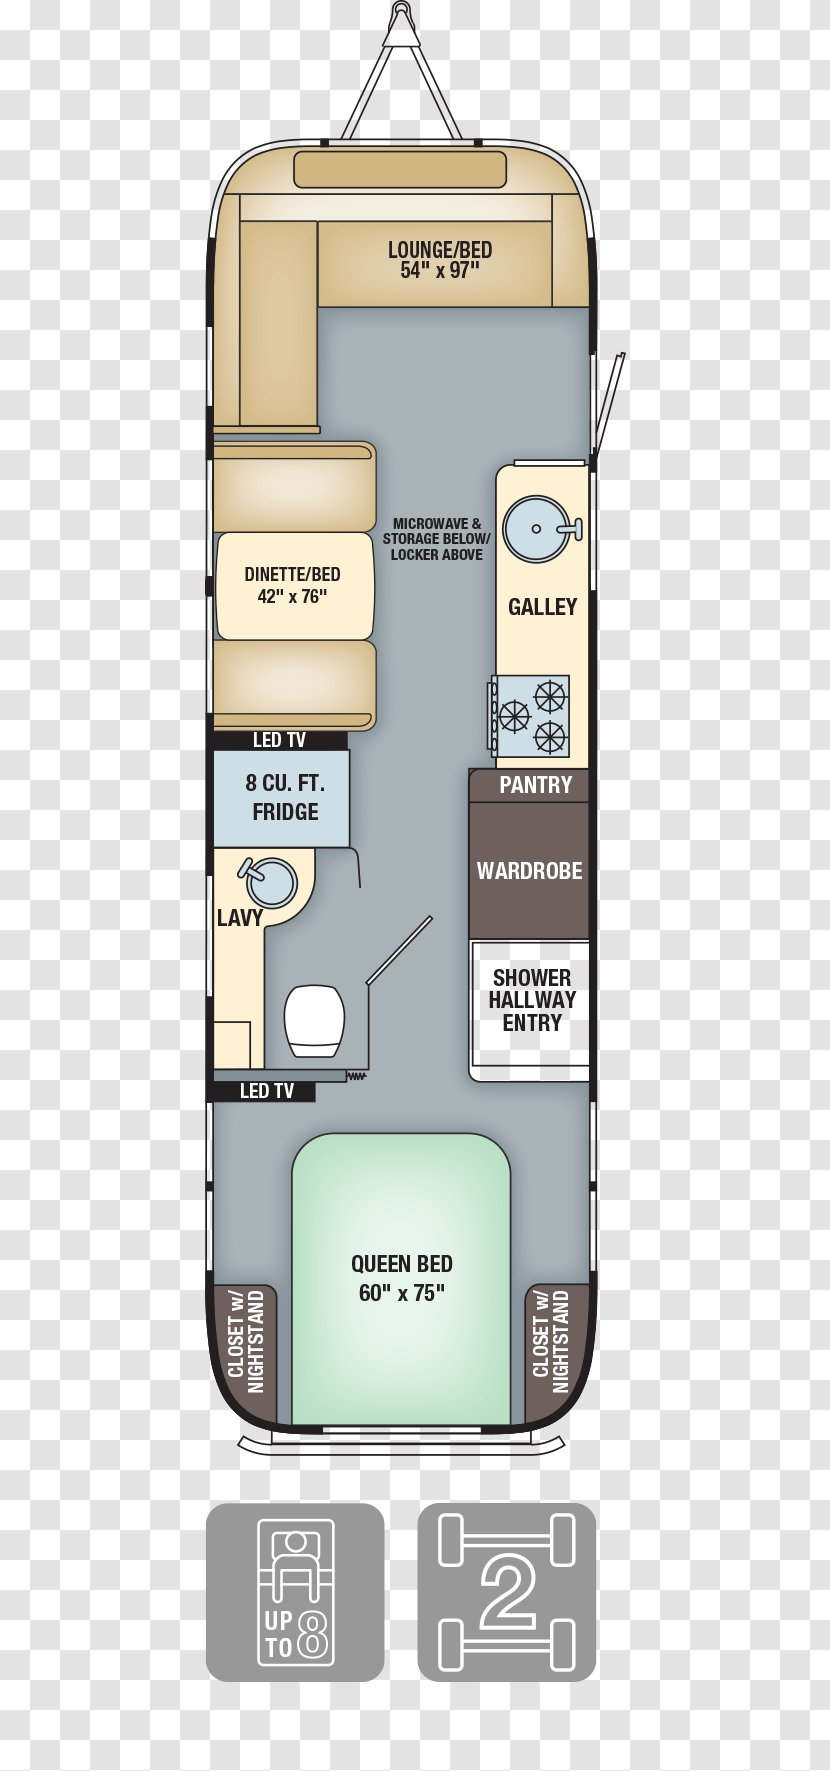 Airstream Caravan Floor Plan Interior Design Services Campervans Specification Bed Transparent Png